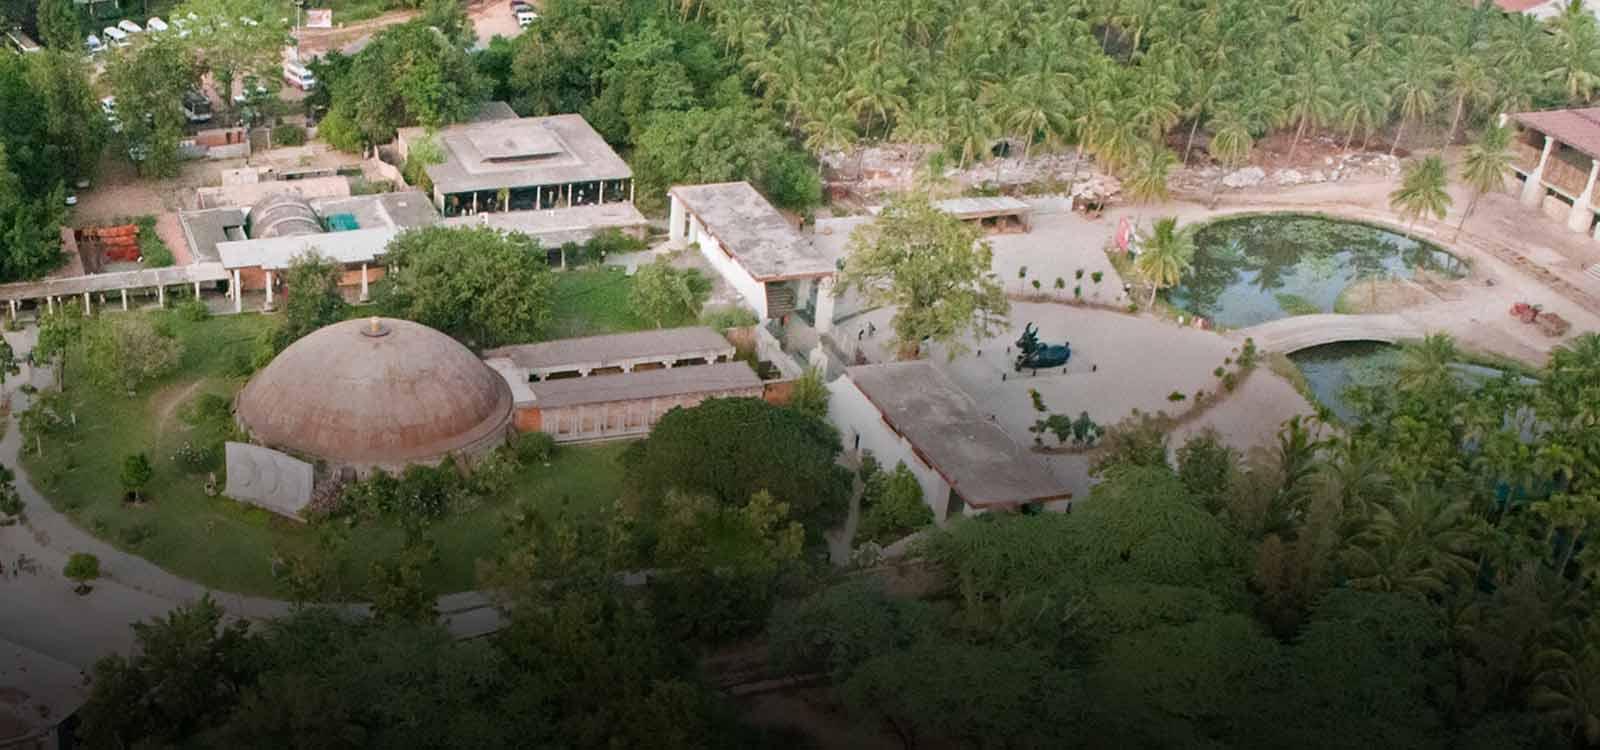 Isha yoga centre, Modi